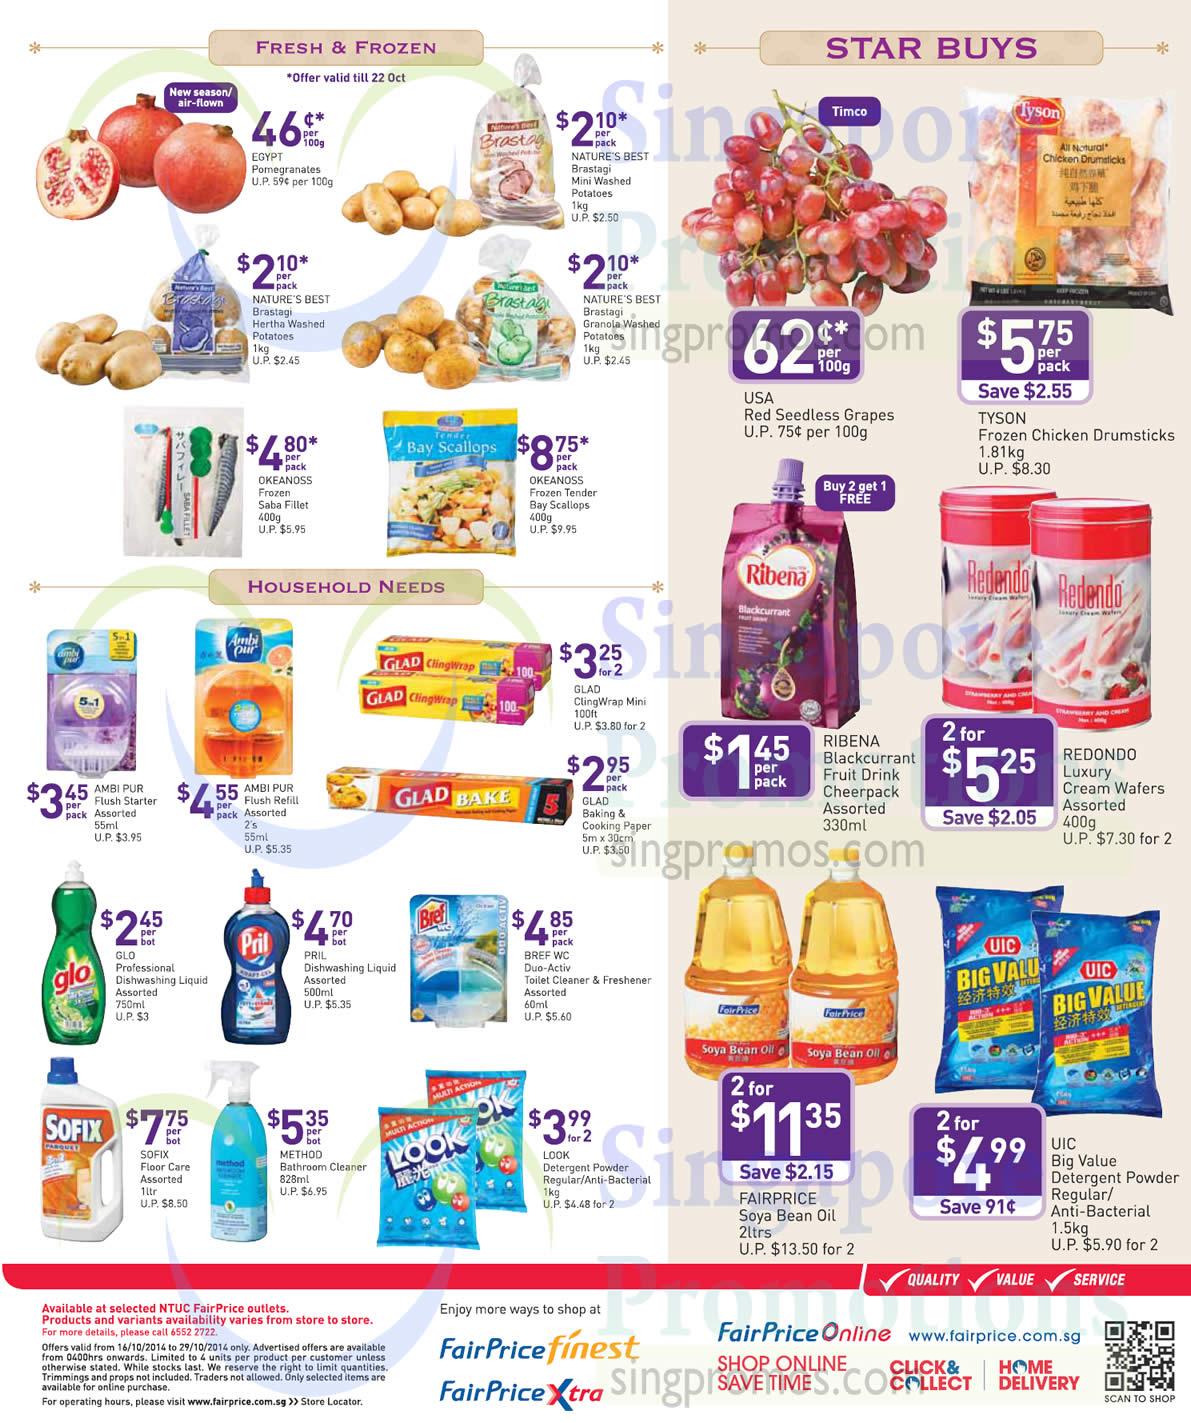 Deepavali Specials Fresh, Frozen, Household Needs, Star Buys